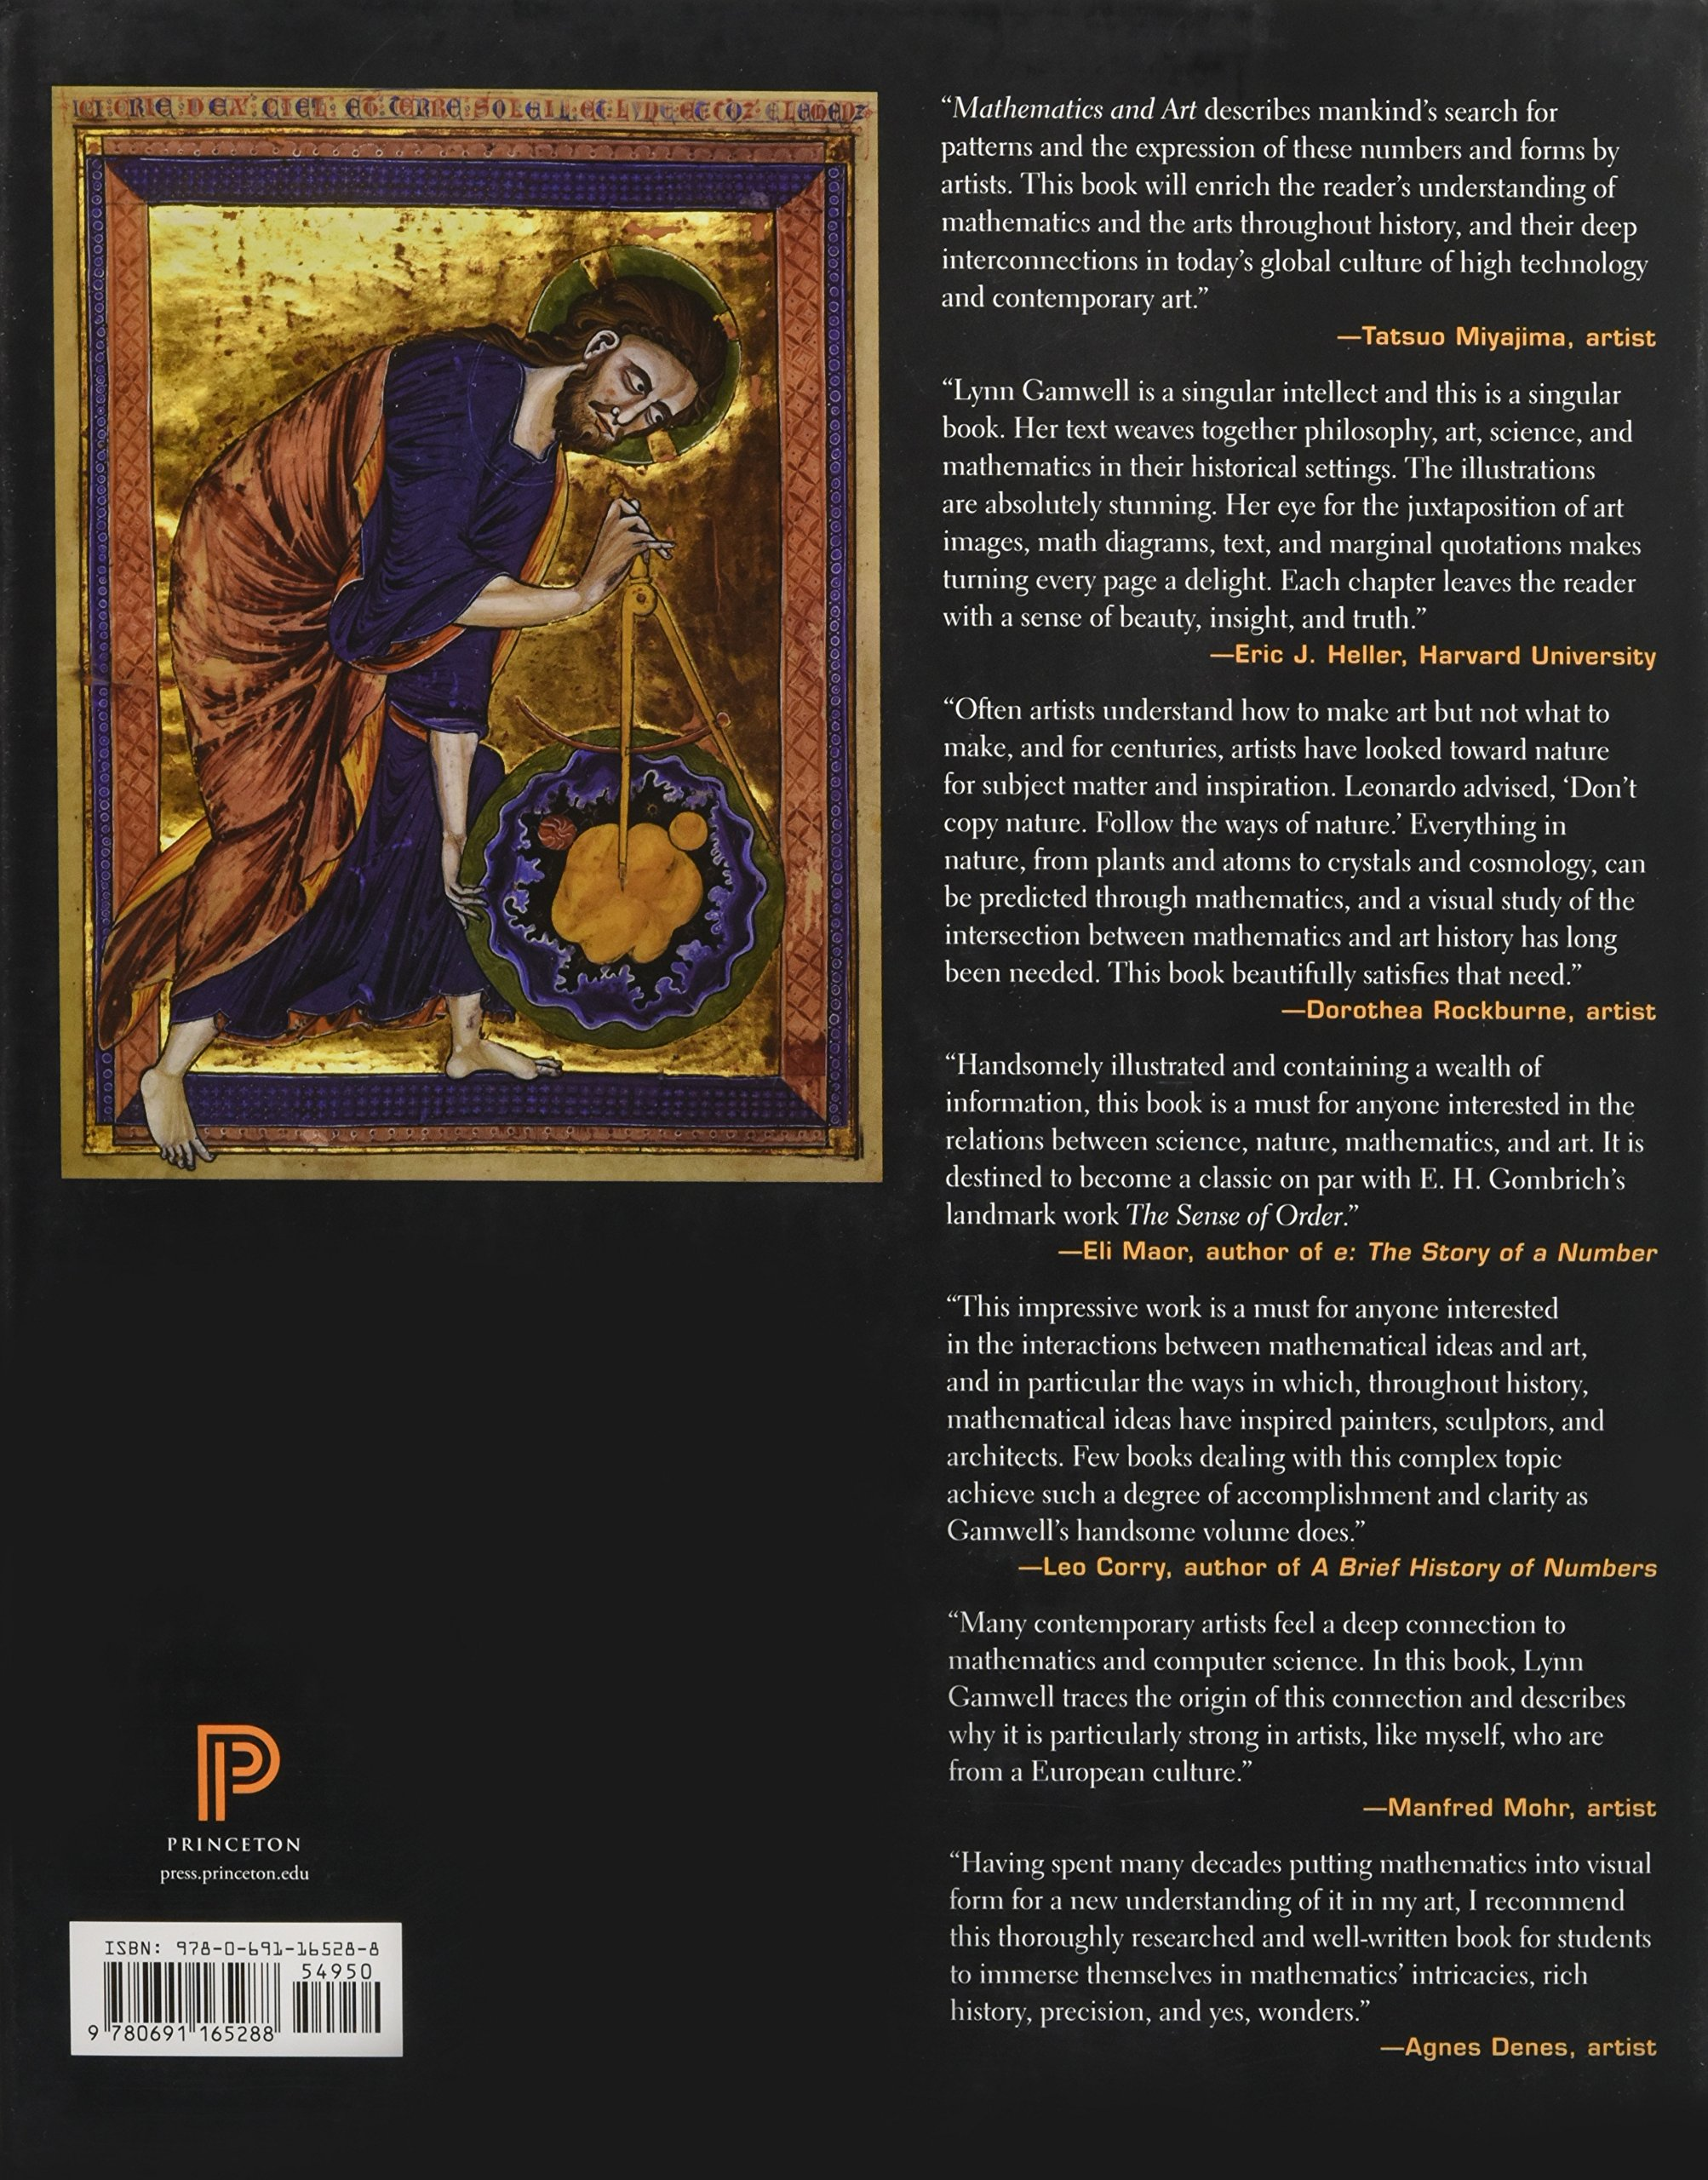 Mathematics And Art: A Cultural History: Lynn Gamwell, Neil Degrasse Tyson:  9780691165288: Amazon: Books